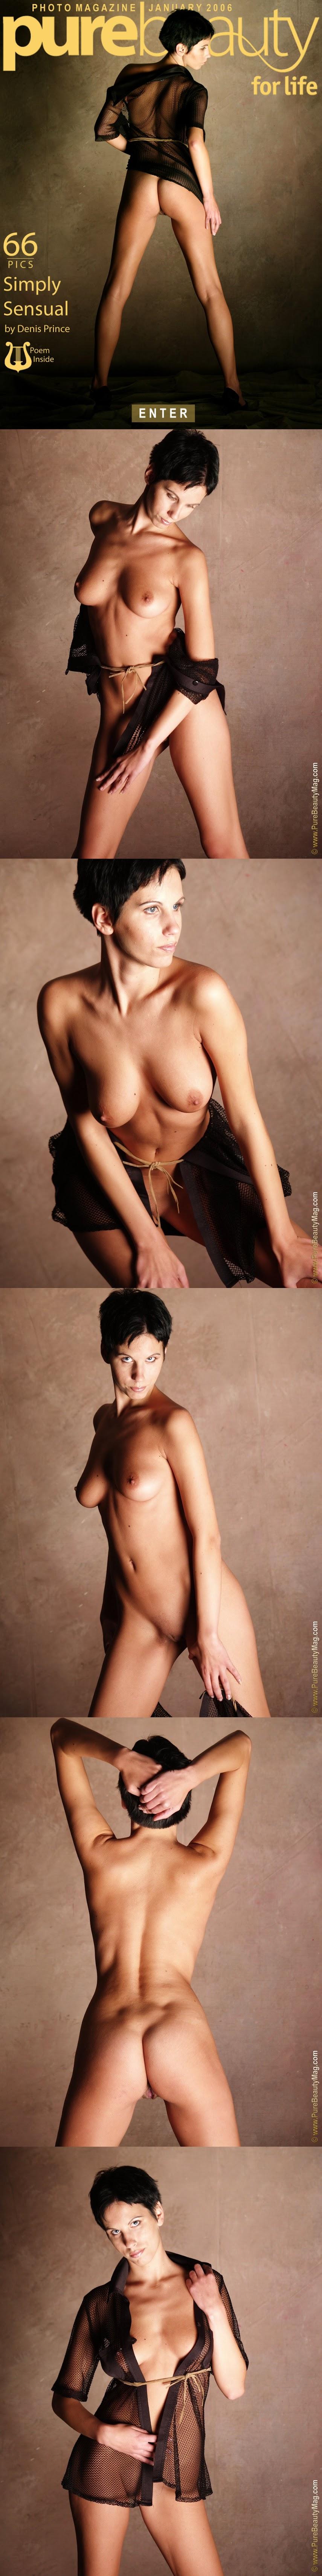 PureBeautyMag PBM  - 2006-01-30 - #s173737 - Eva Szaflarska - Its Ready - 2560px - idols